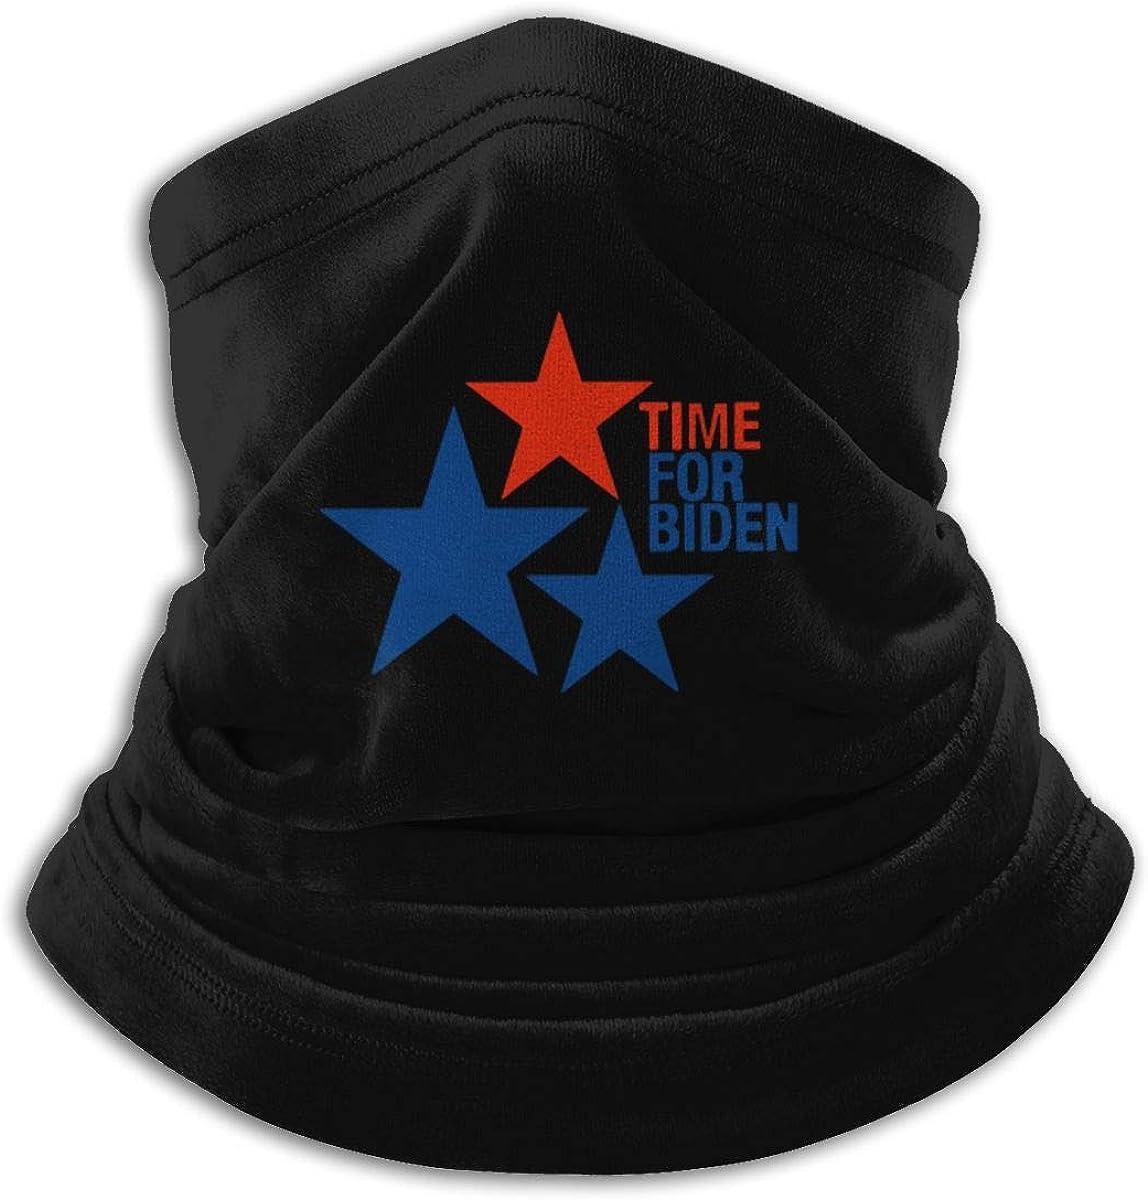 Joe Biden 2020 Black Multi-function Neck Warmer Gaiter Polyester Neck Warmer Windproof Winter Neck Gaiter Cold Weather Scarf For Men Women